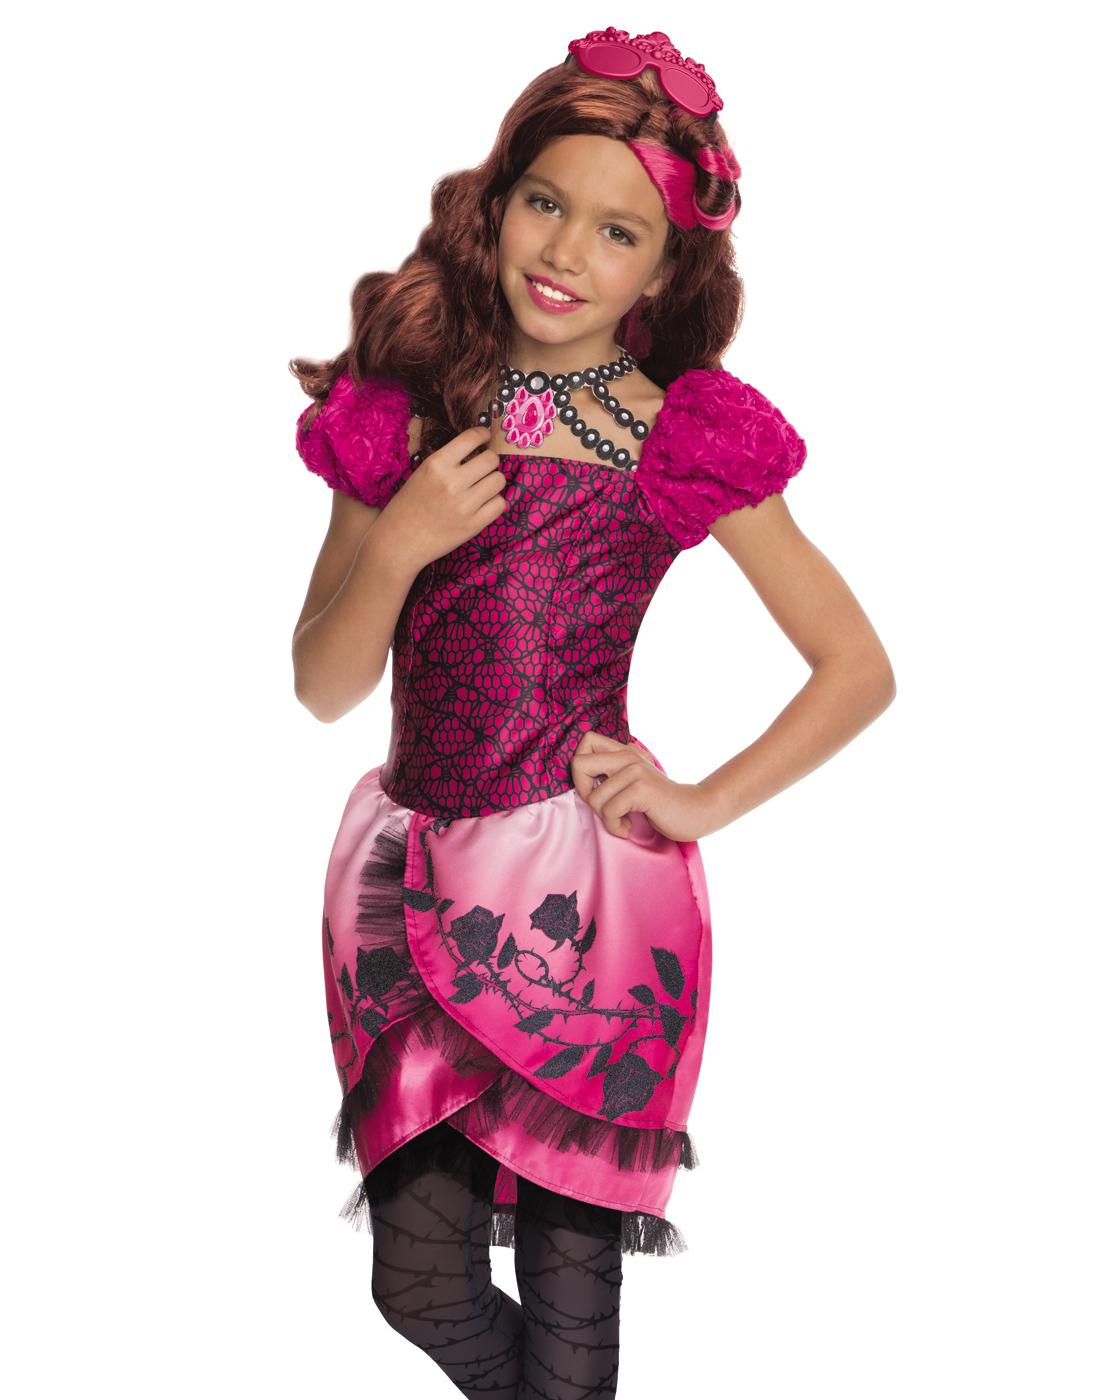 Rubie's Costume Co Ever After High Briar Beauty Girls Sleeping Beauty Princess Halloween Costume at Sears.com